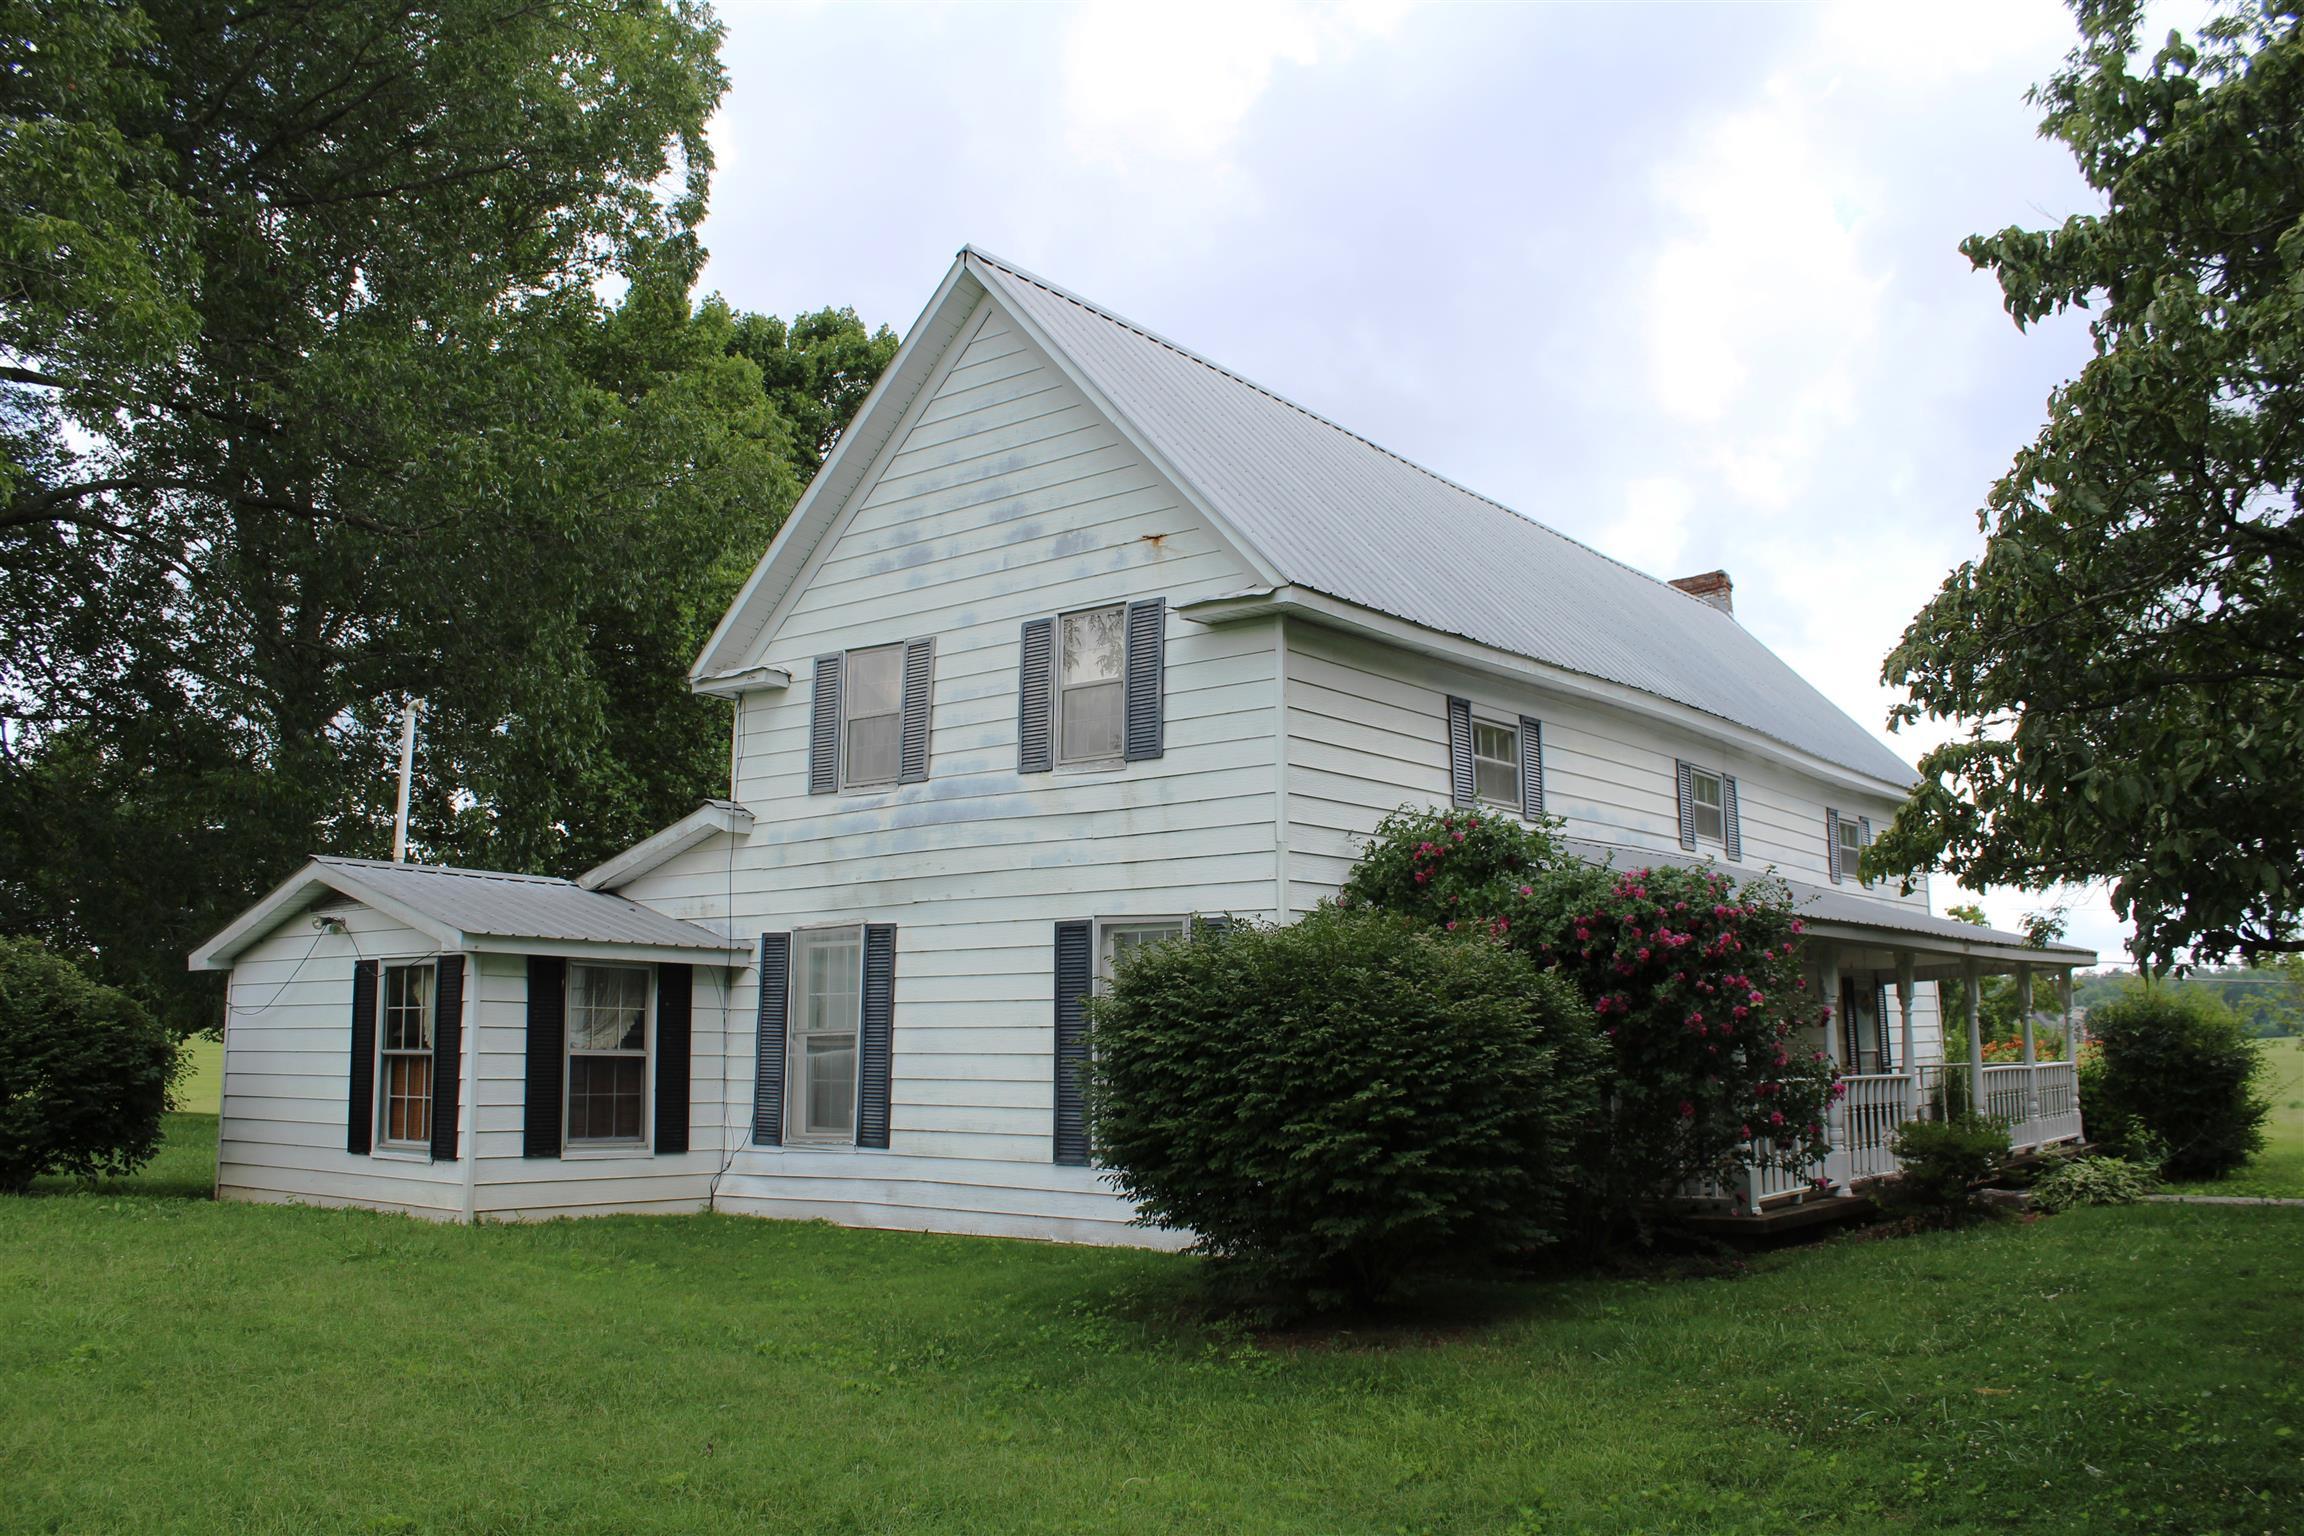 26 Delores Lane, McMinnville, TN 37110 - McMinnville, TN real estate listing